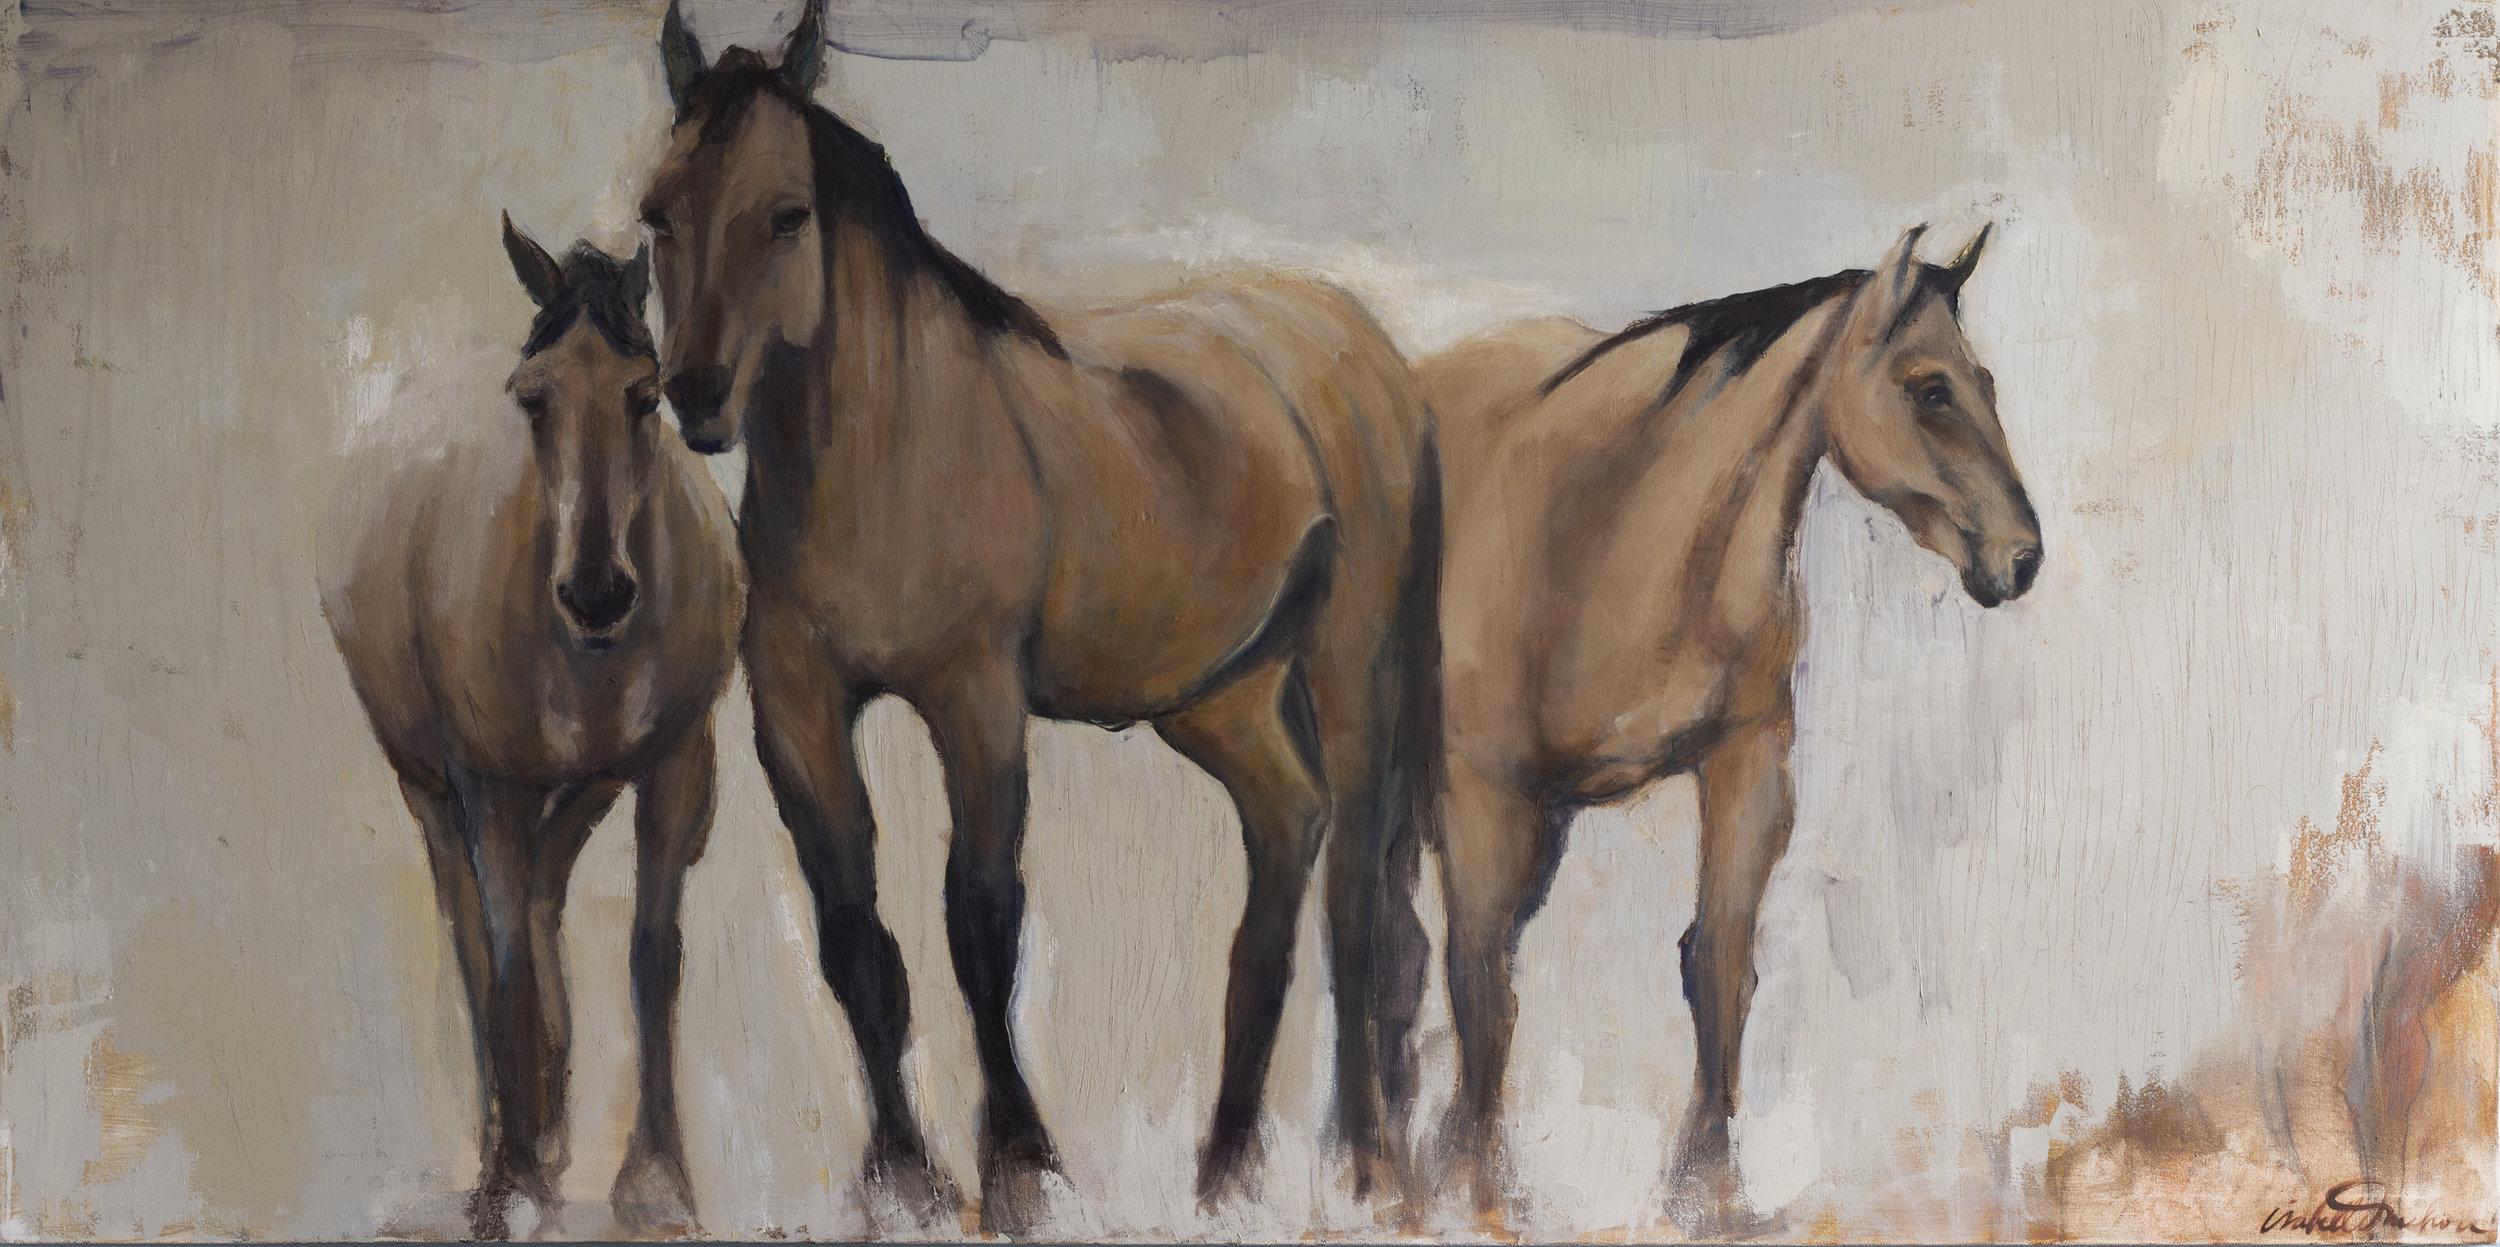 THREE HORSES STARING